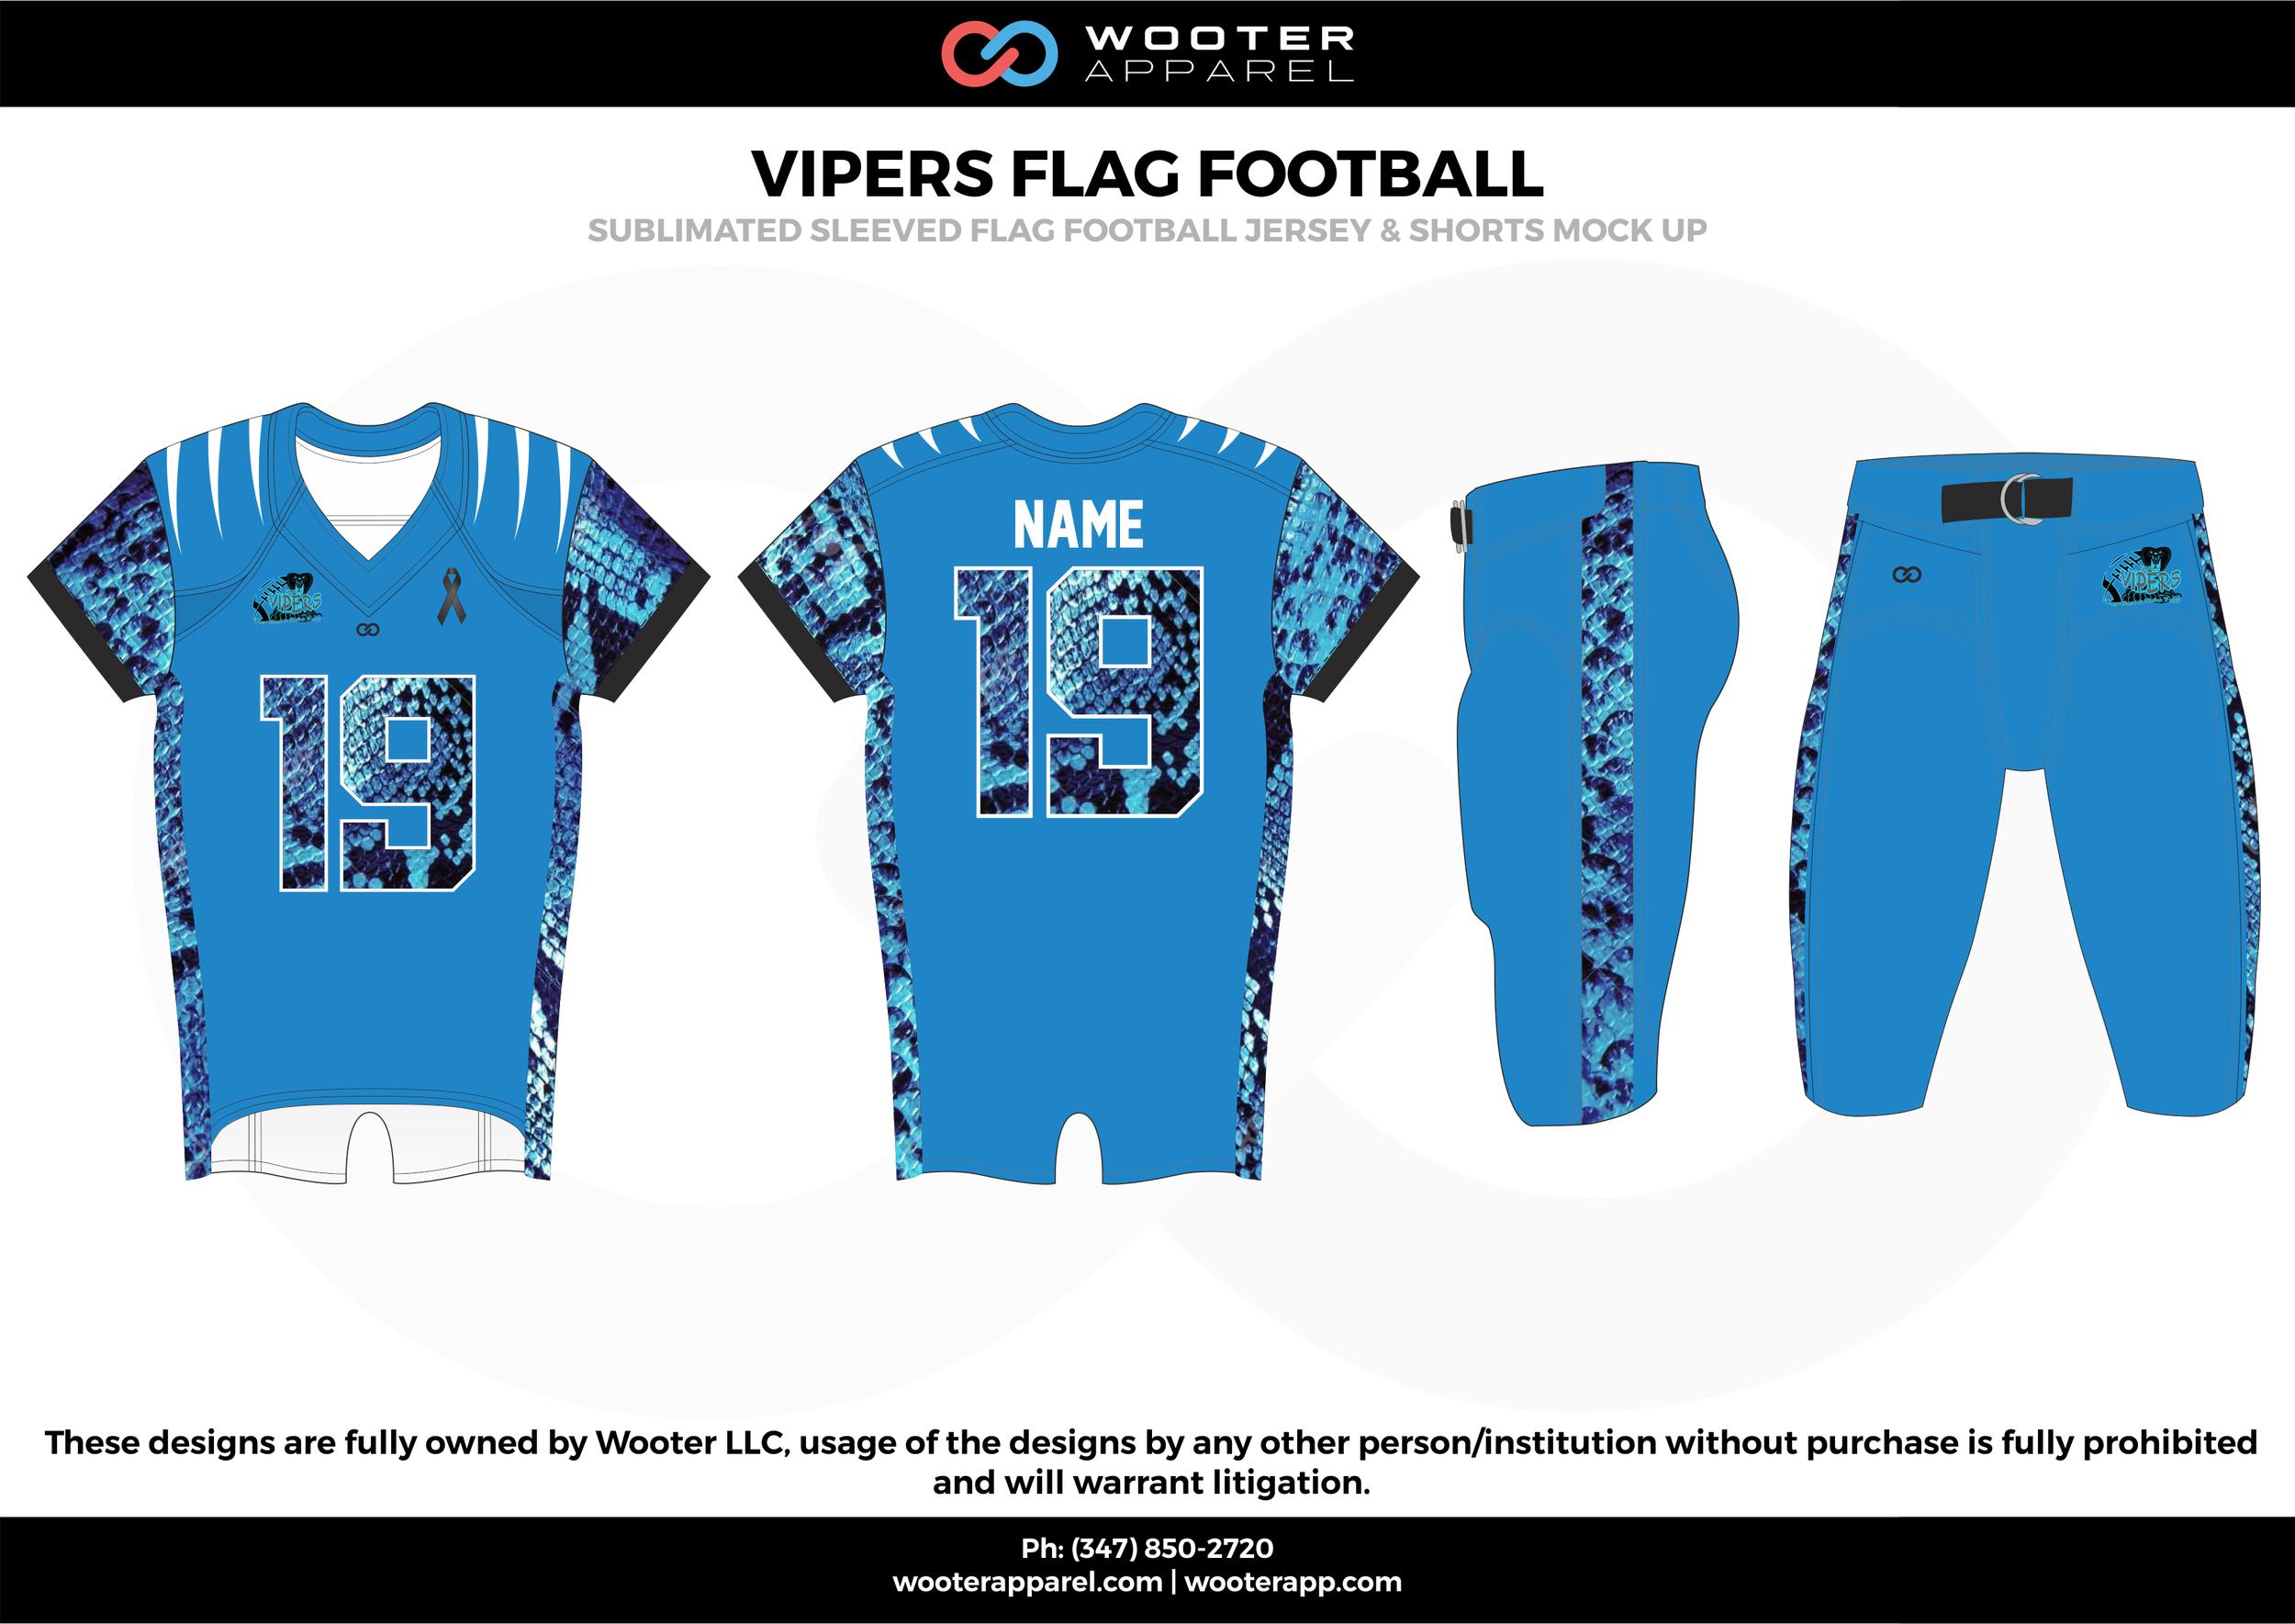 VIPERS FLAG FOOTBALL blue black white flag football uniforms jerseys pants